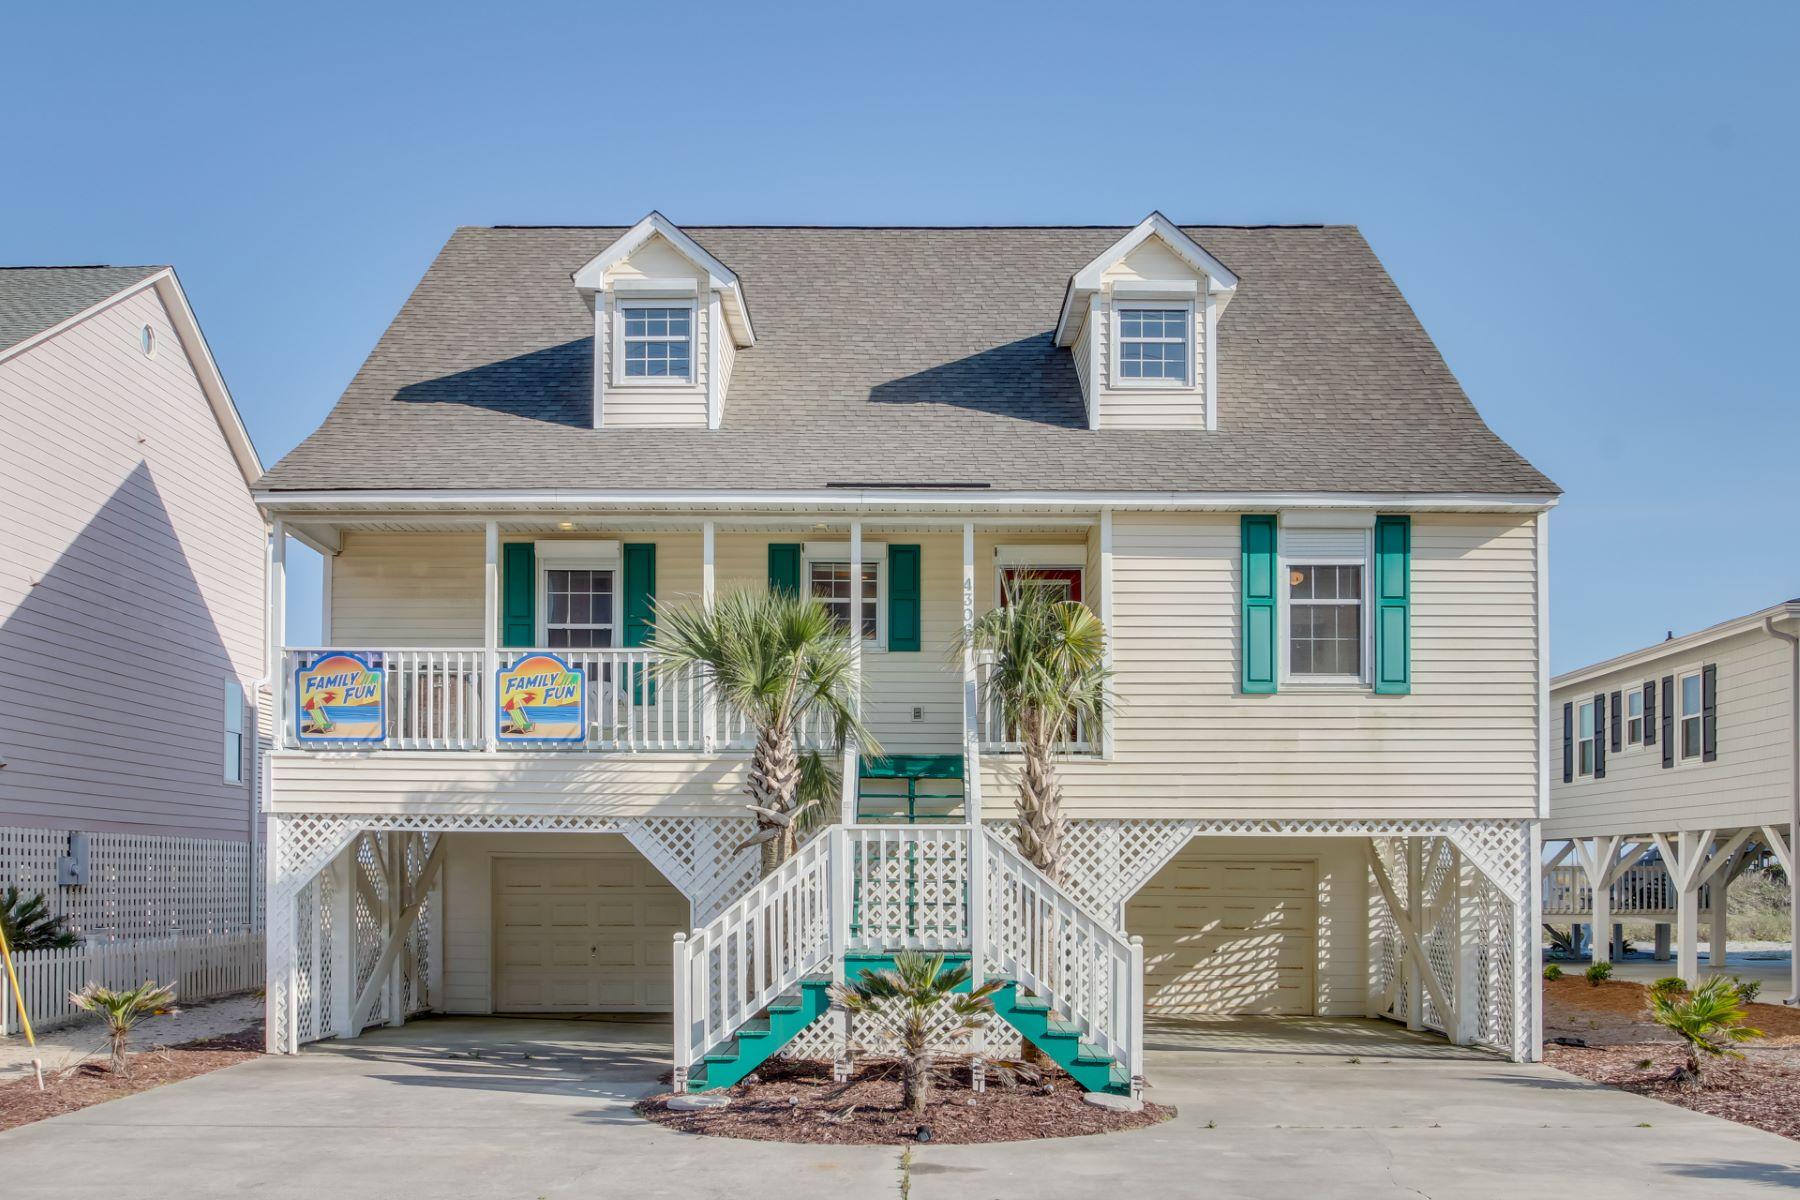 独户住宅 为 销售 在 Surf and Sand 4306 N Ocean North Myrtle Beach, 南卡罗来纳州, 29582 美国